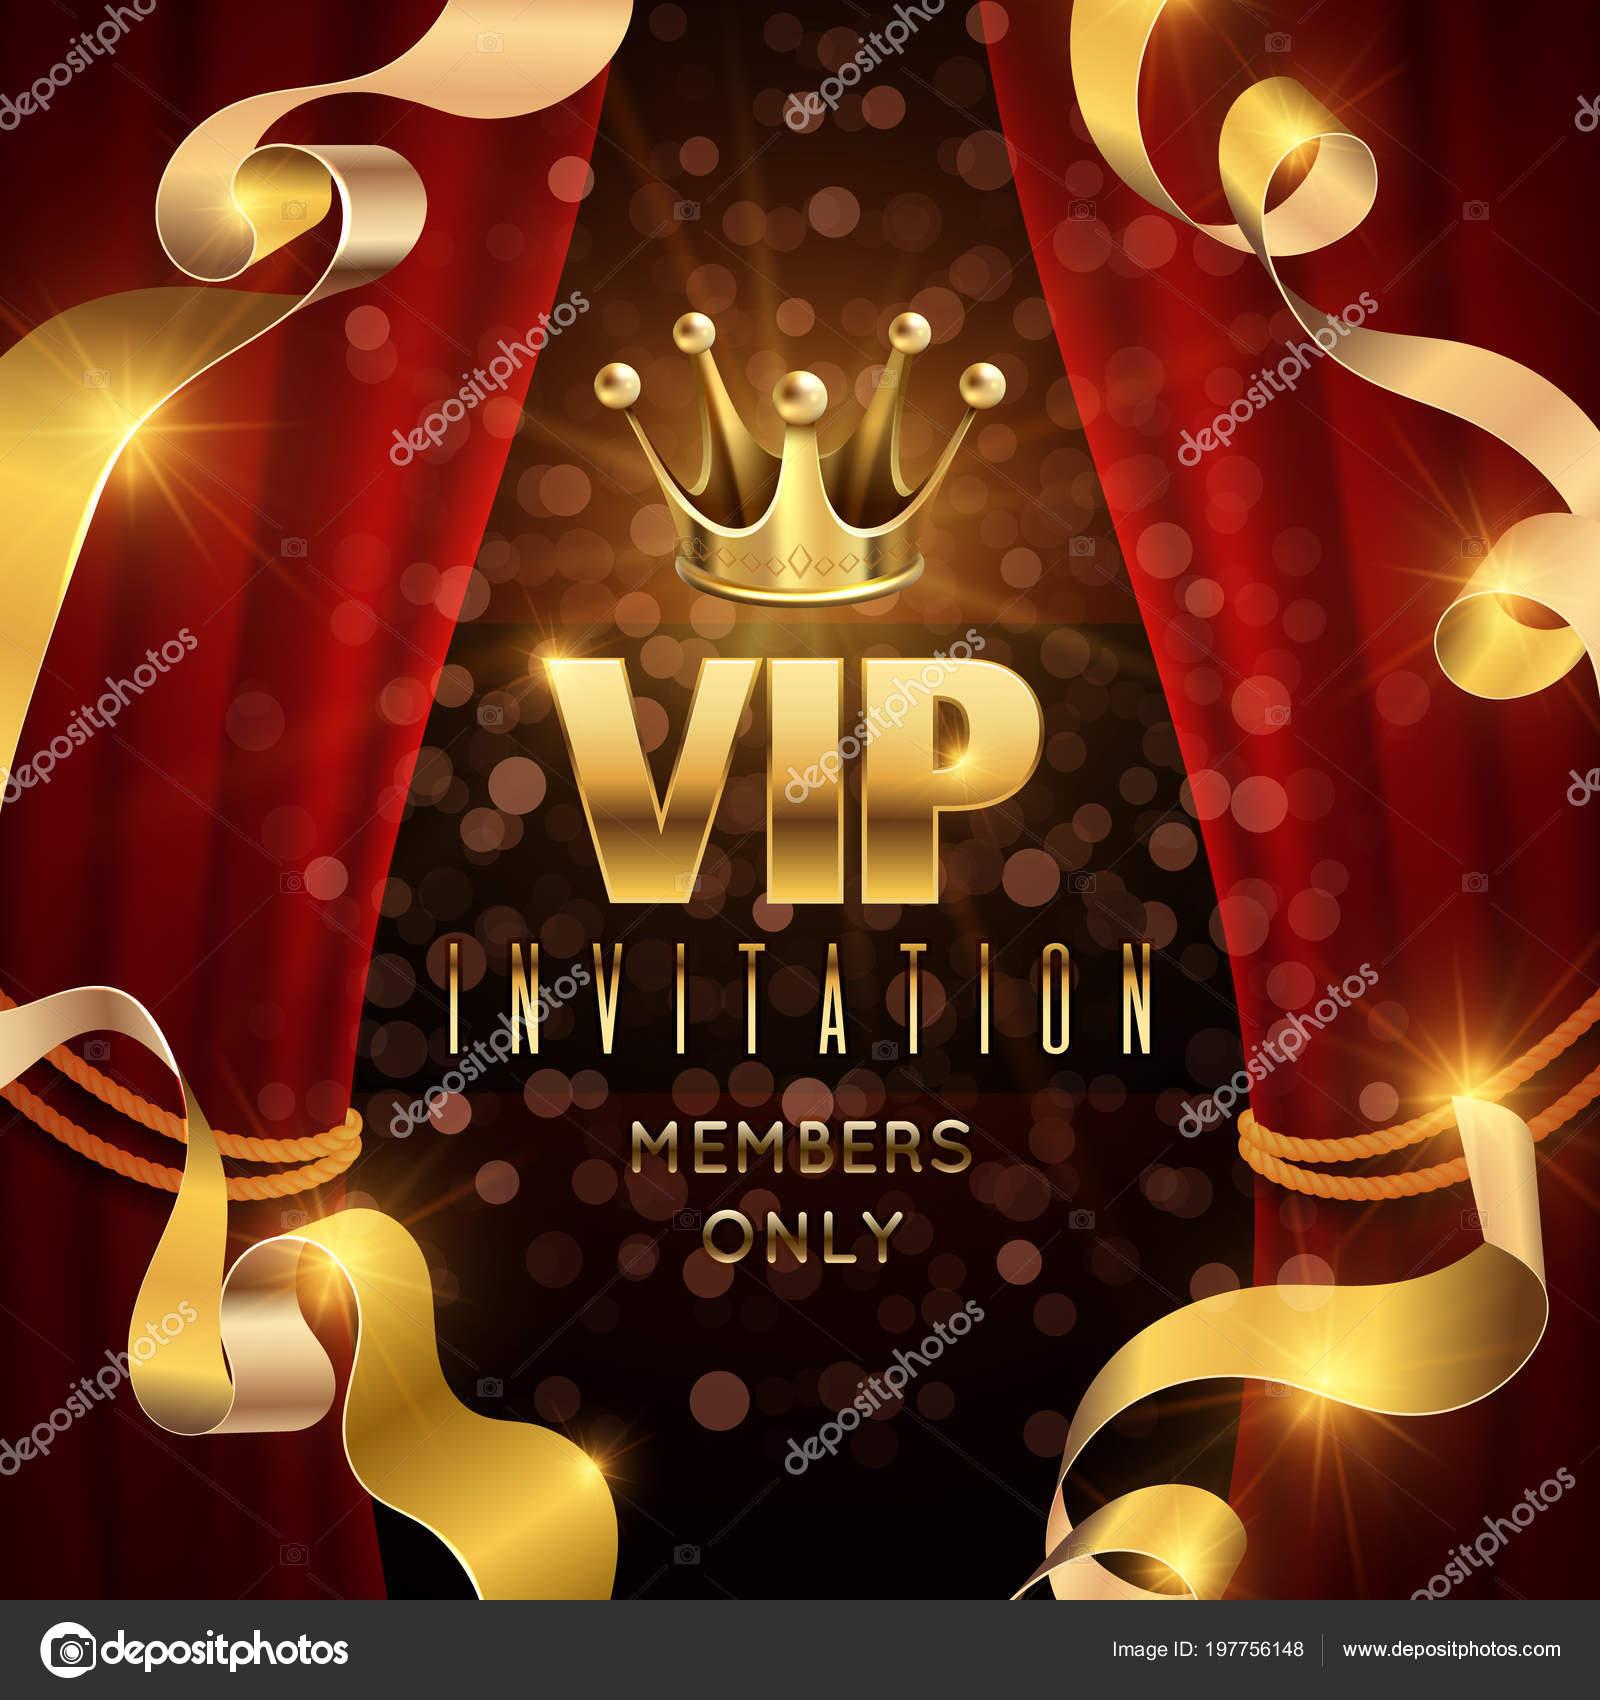 Elegance Et Soiree Exclusive Vector Invitation Avec Luxe Or Couronne